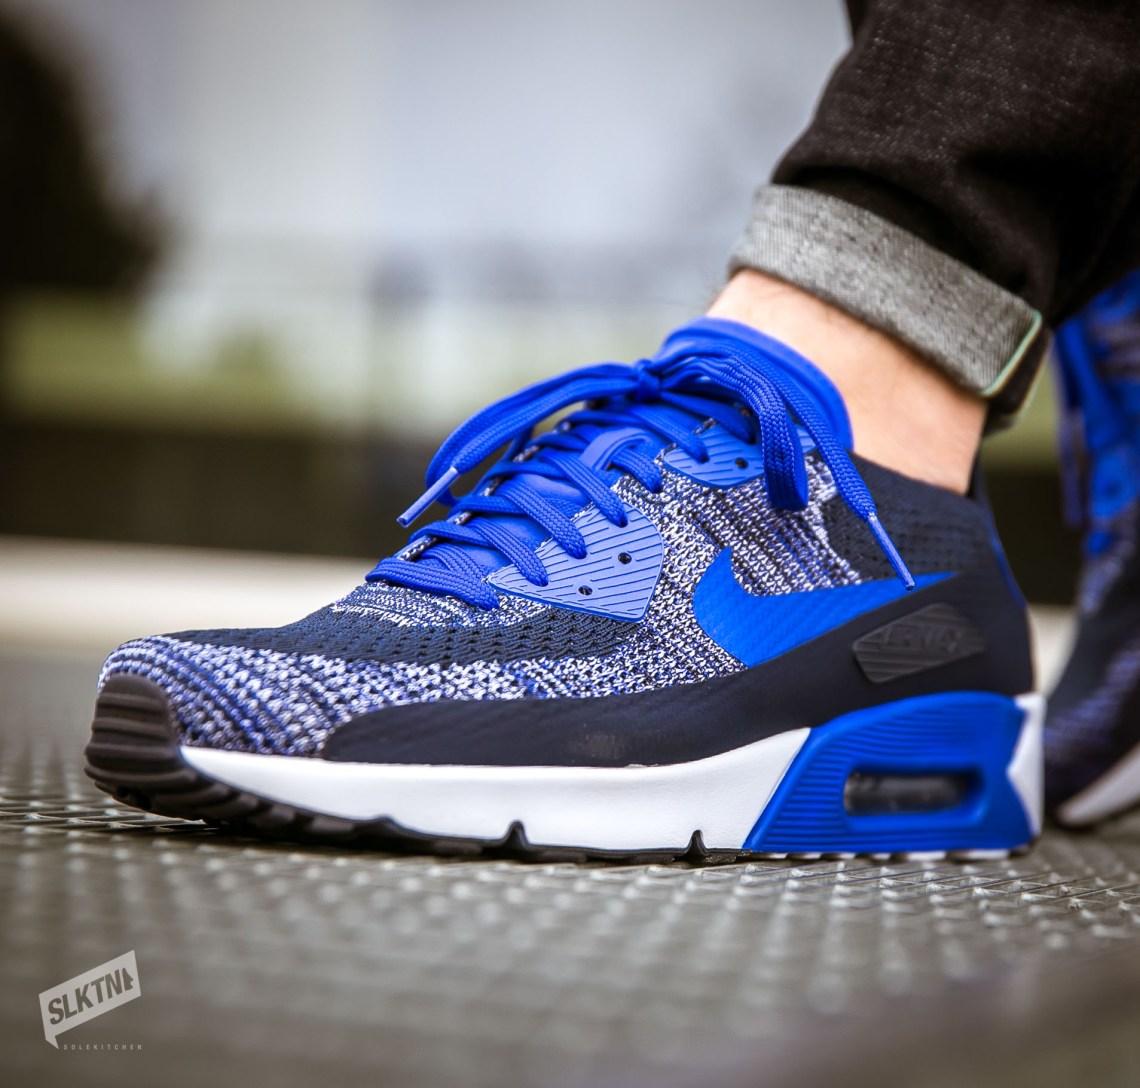 check out 07c74 3e5f9 Nike Air Max 90 Ultra 2.0